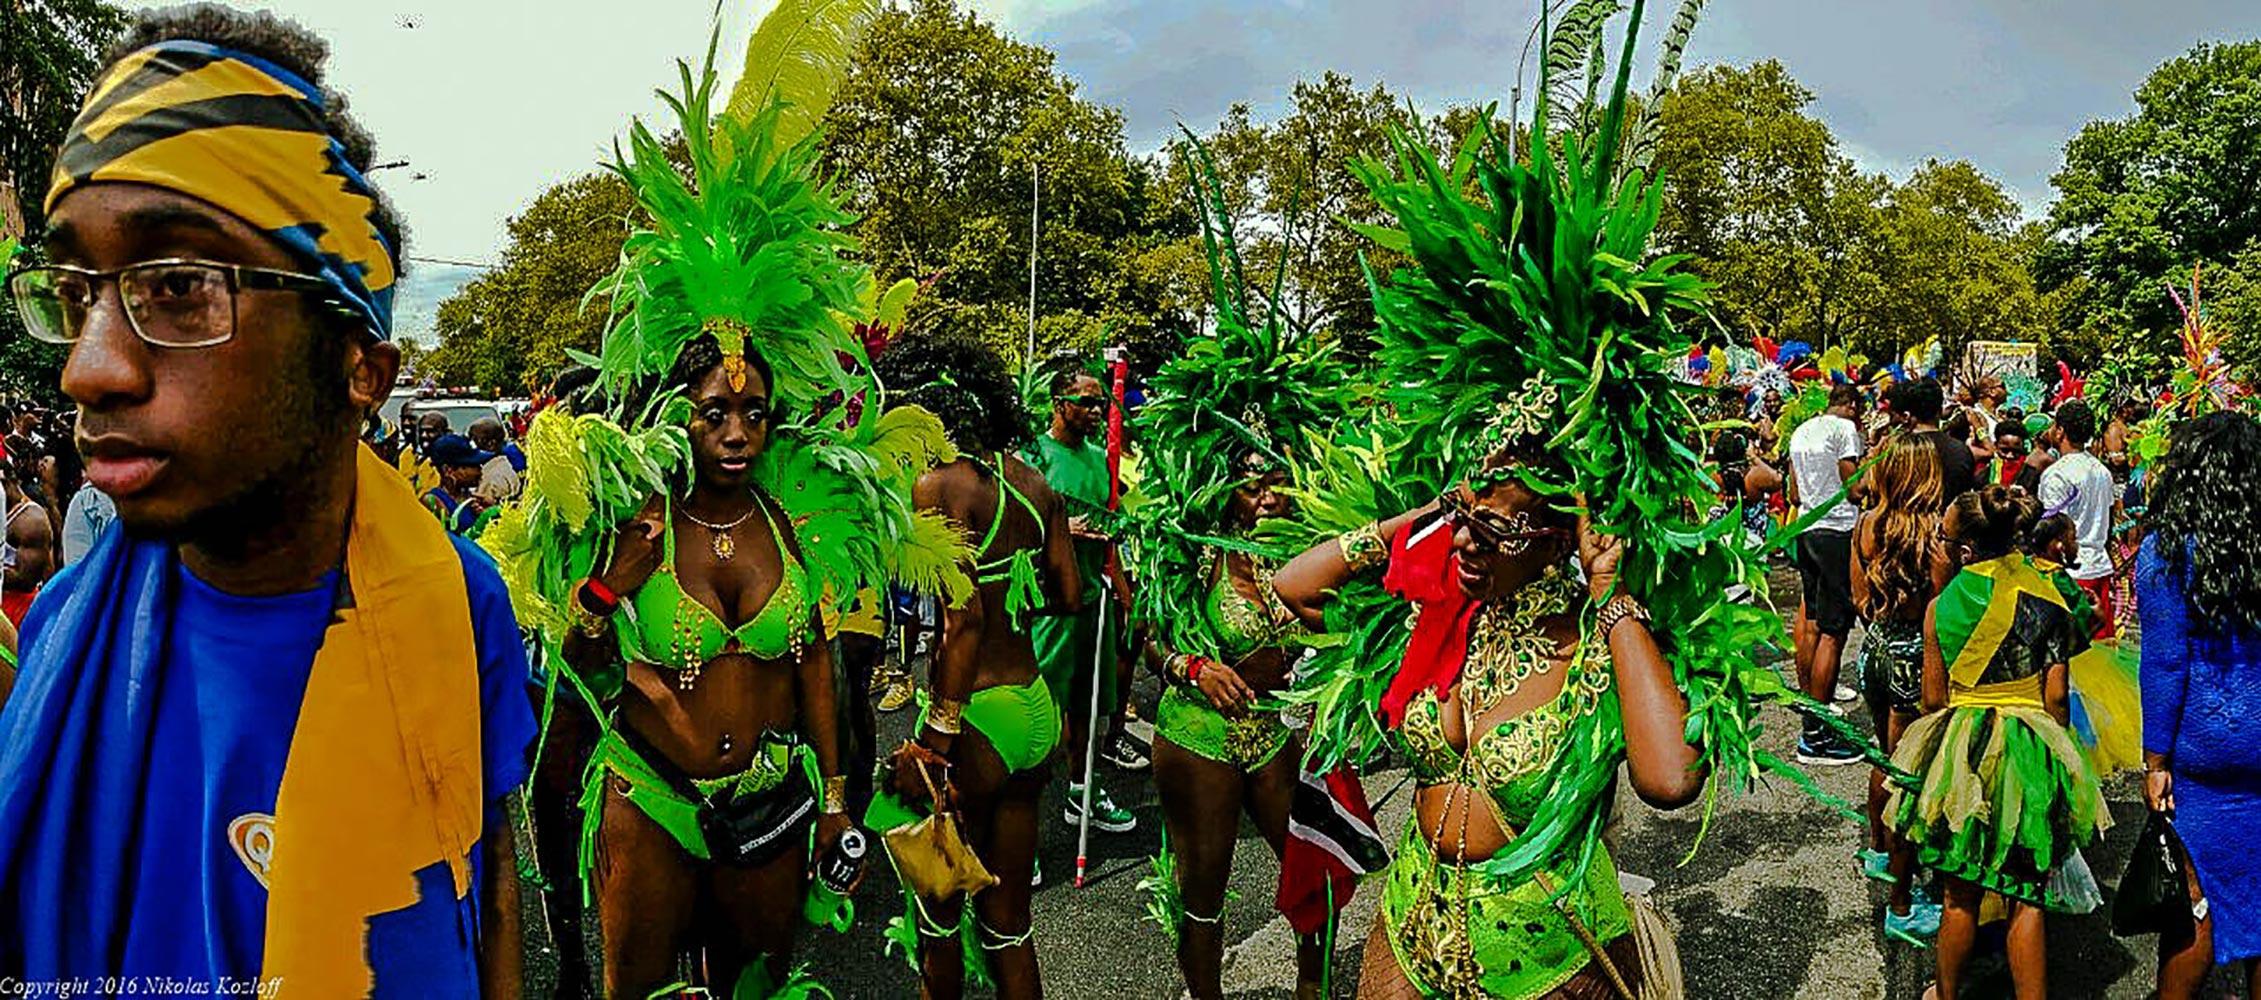 BarbadosMasqueraderLR